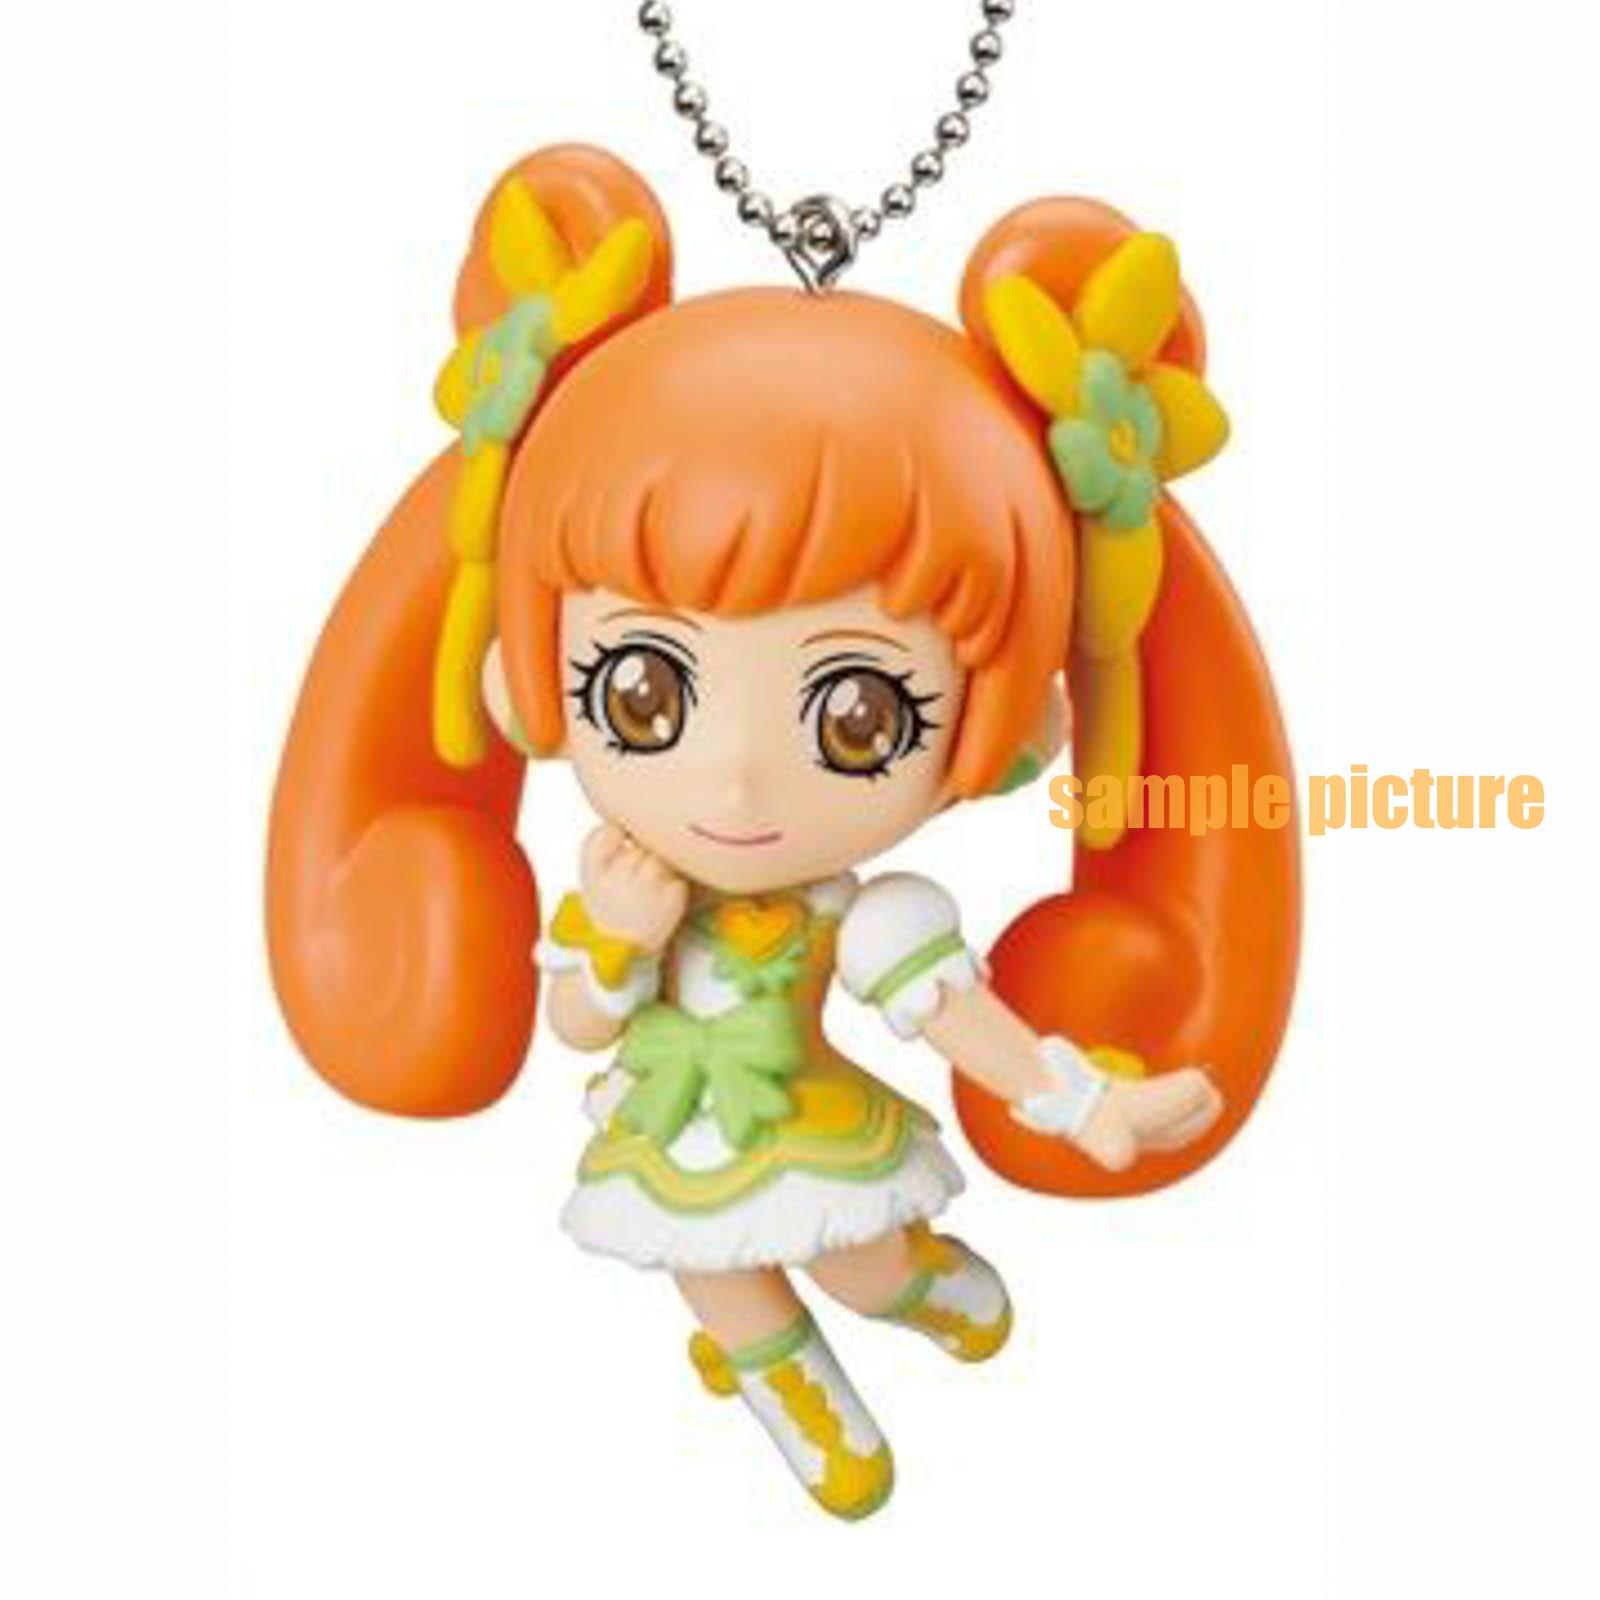 Doki Doki! PreCure Cure Rosetta Mascot Figure Ball Keychain JAPAN ANIME